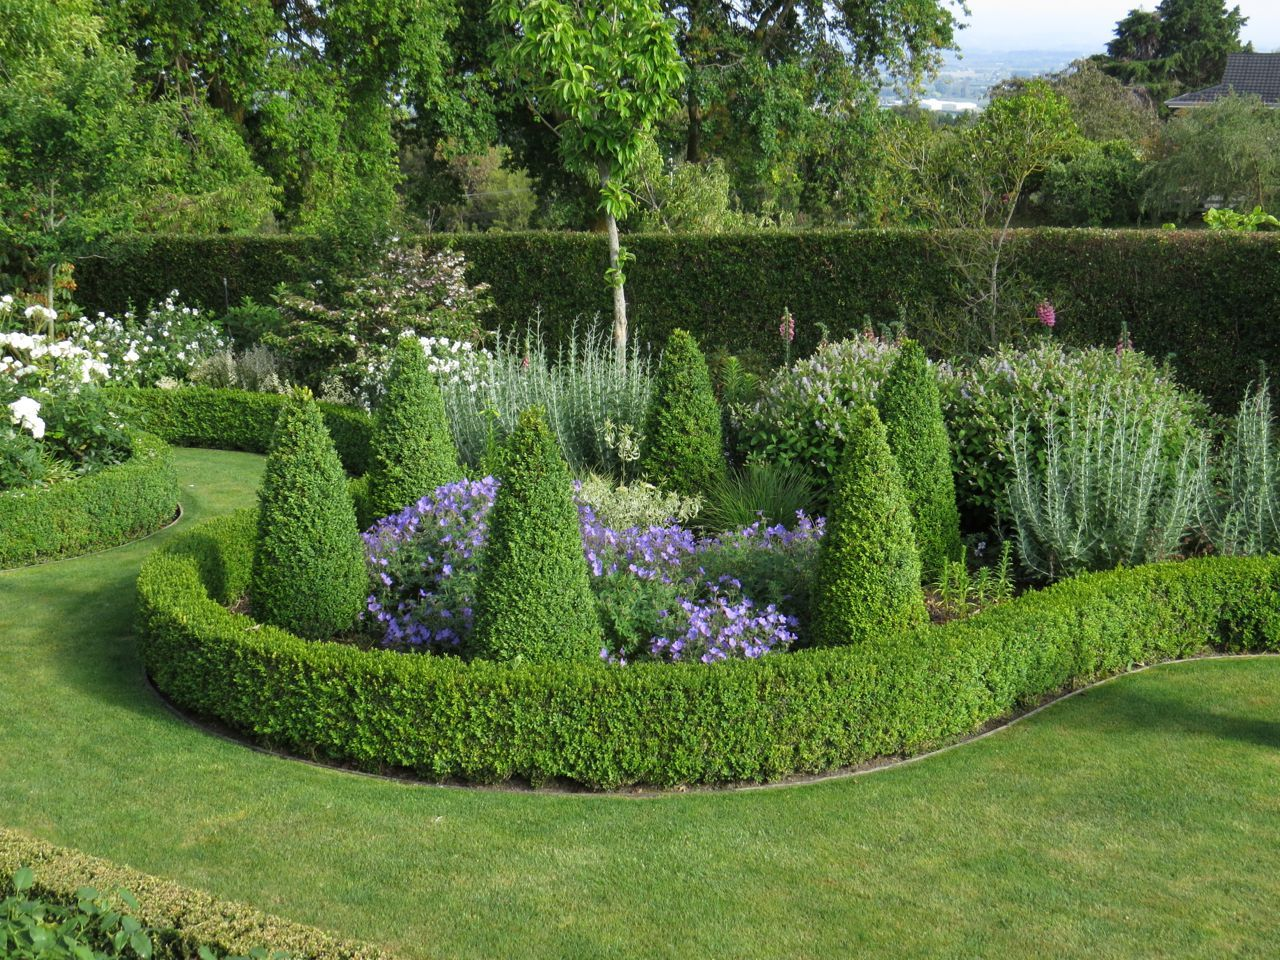 Moss Landscape Design (NZ) (With images) | Landscape ...